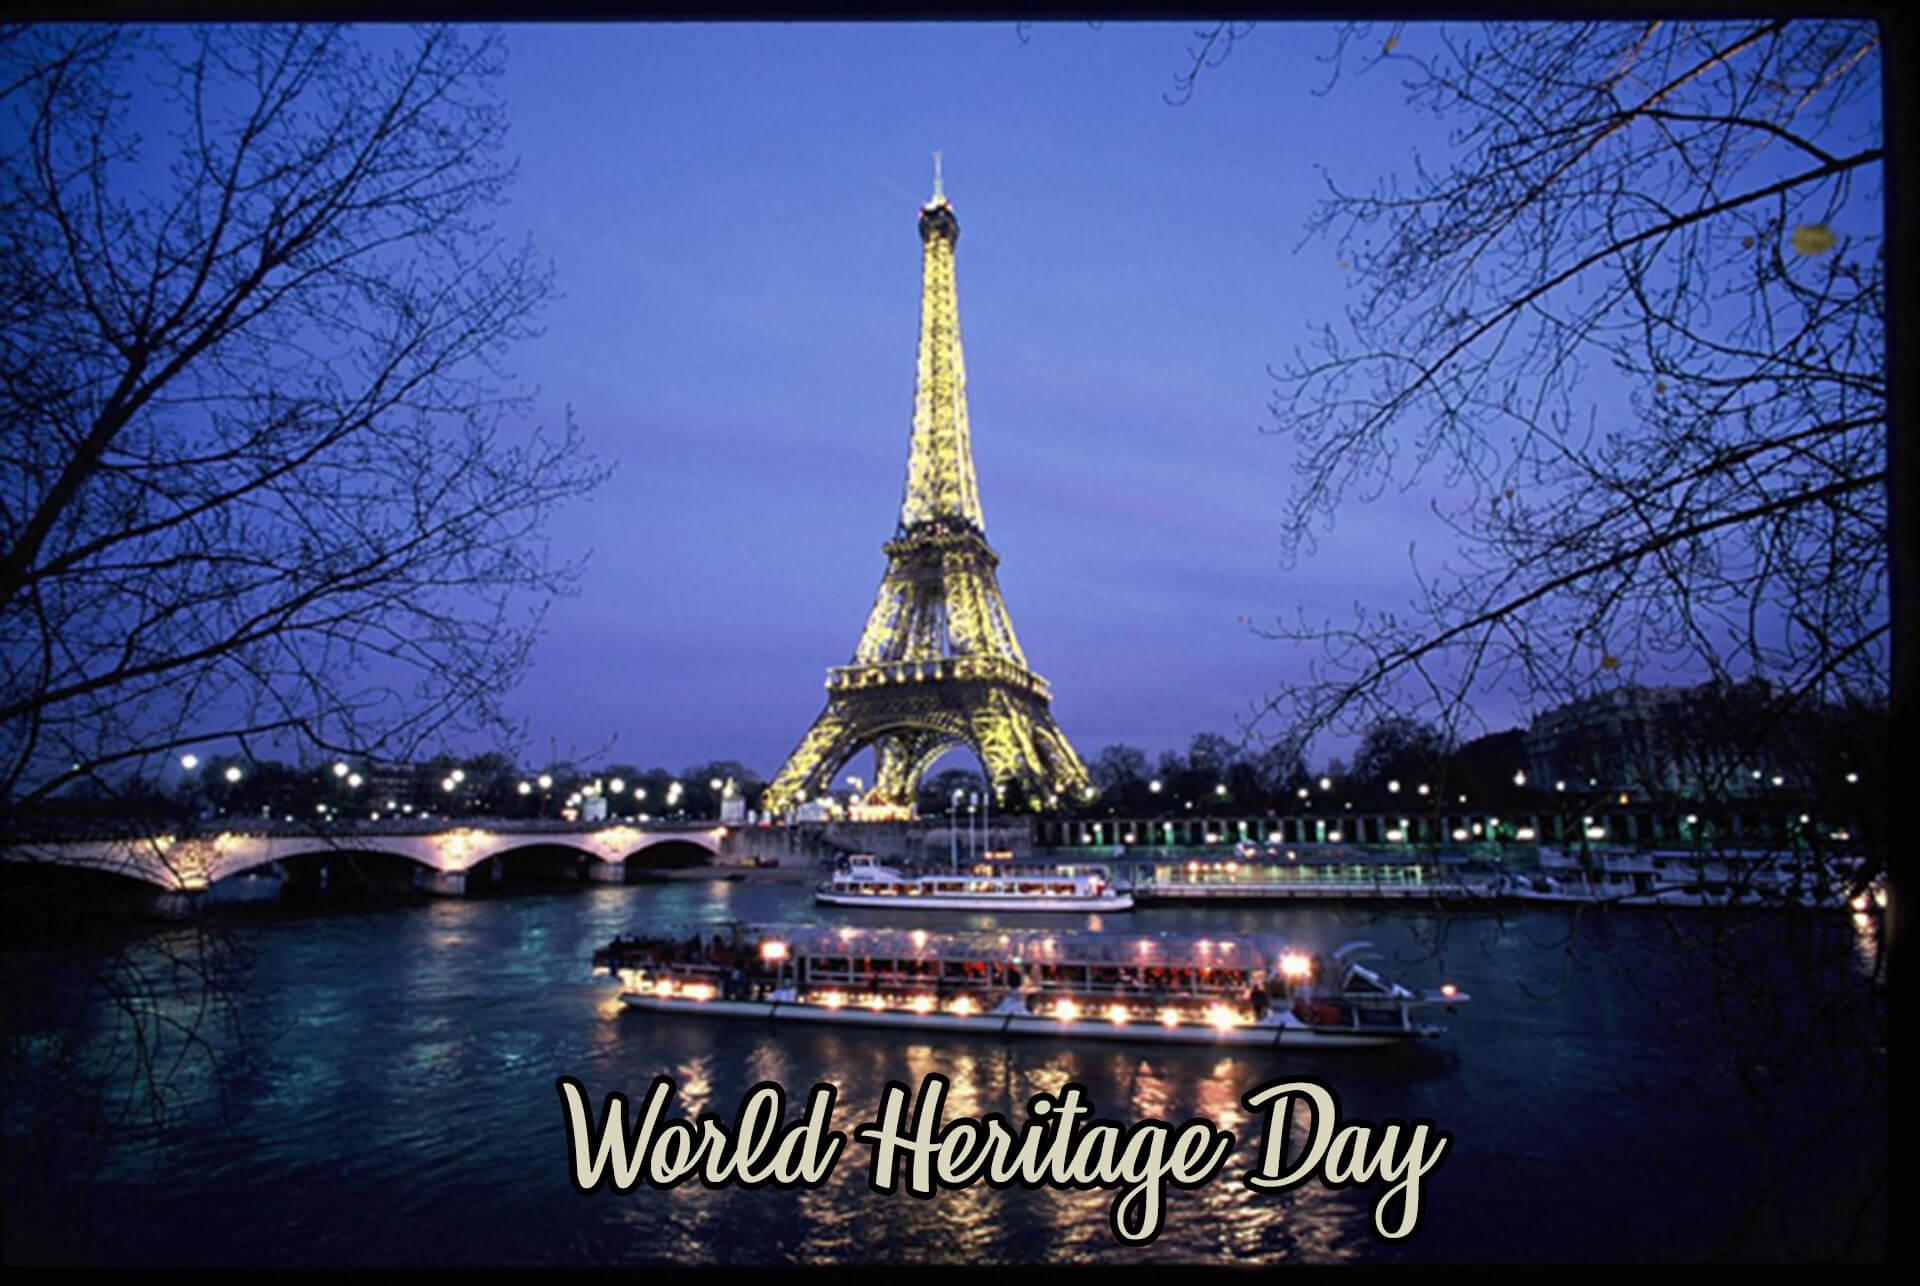 world heritage day monuments 7 wonders eiffel tower london paris wallpaper